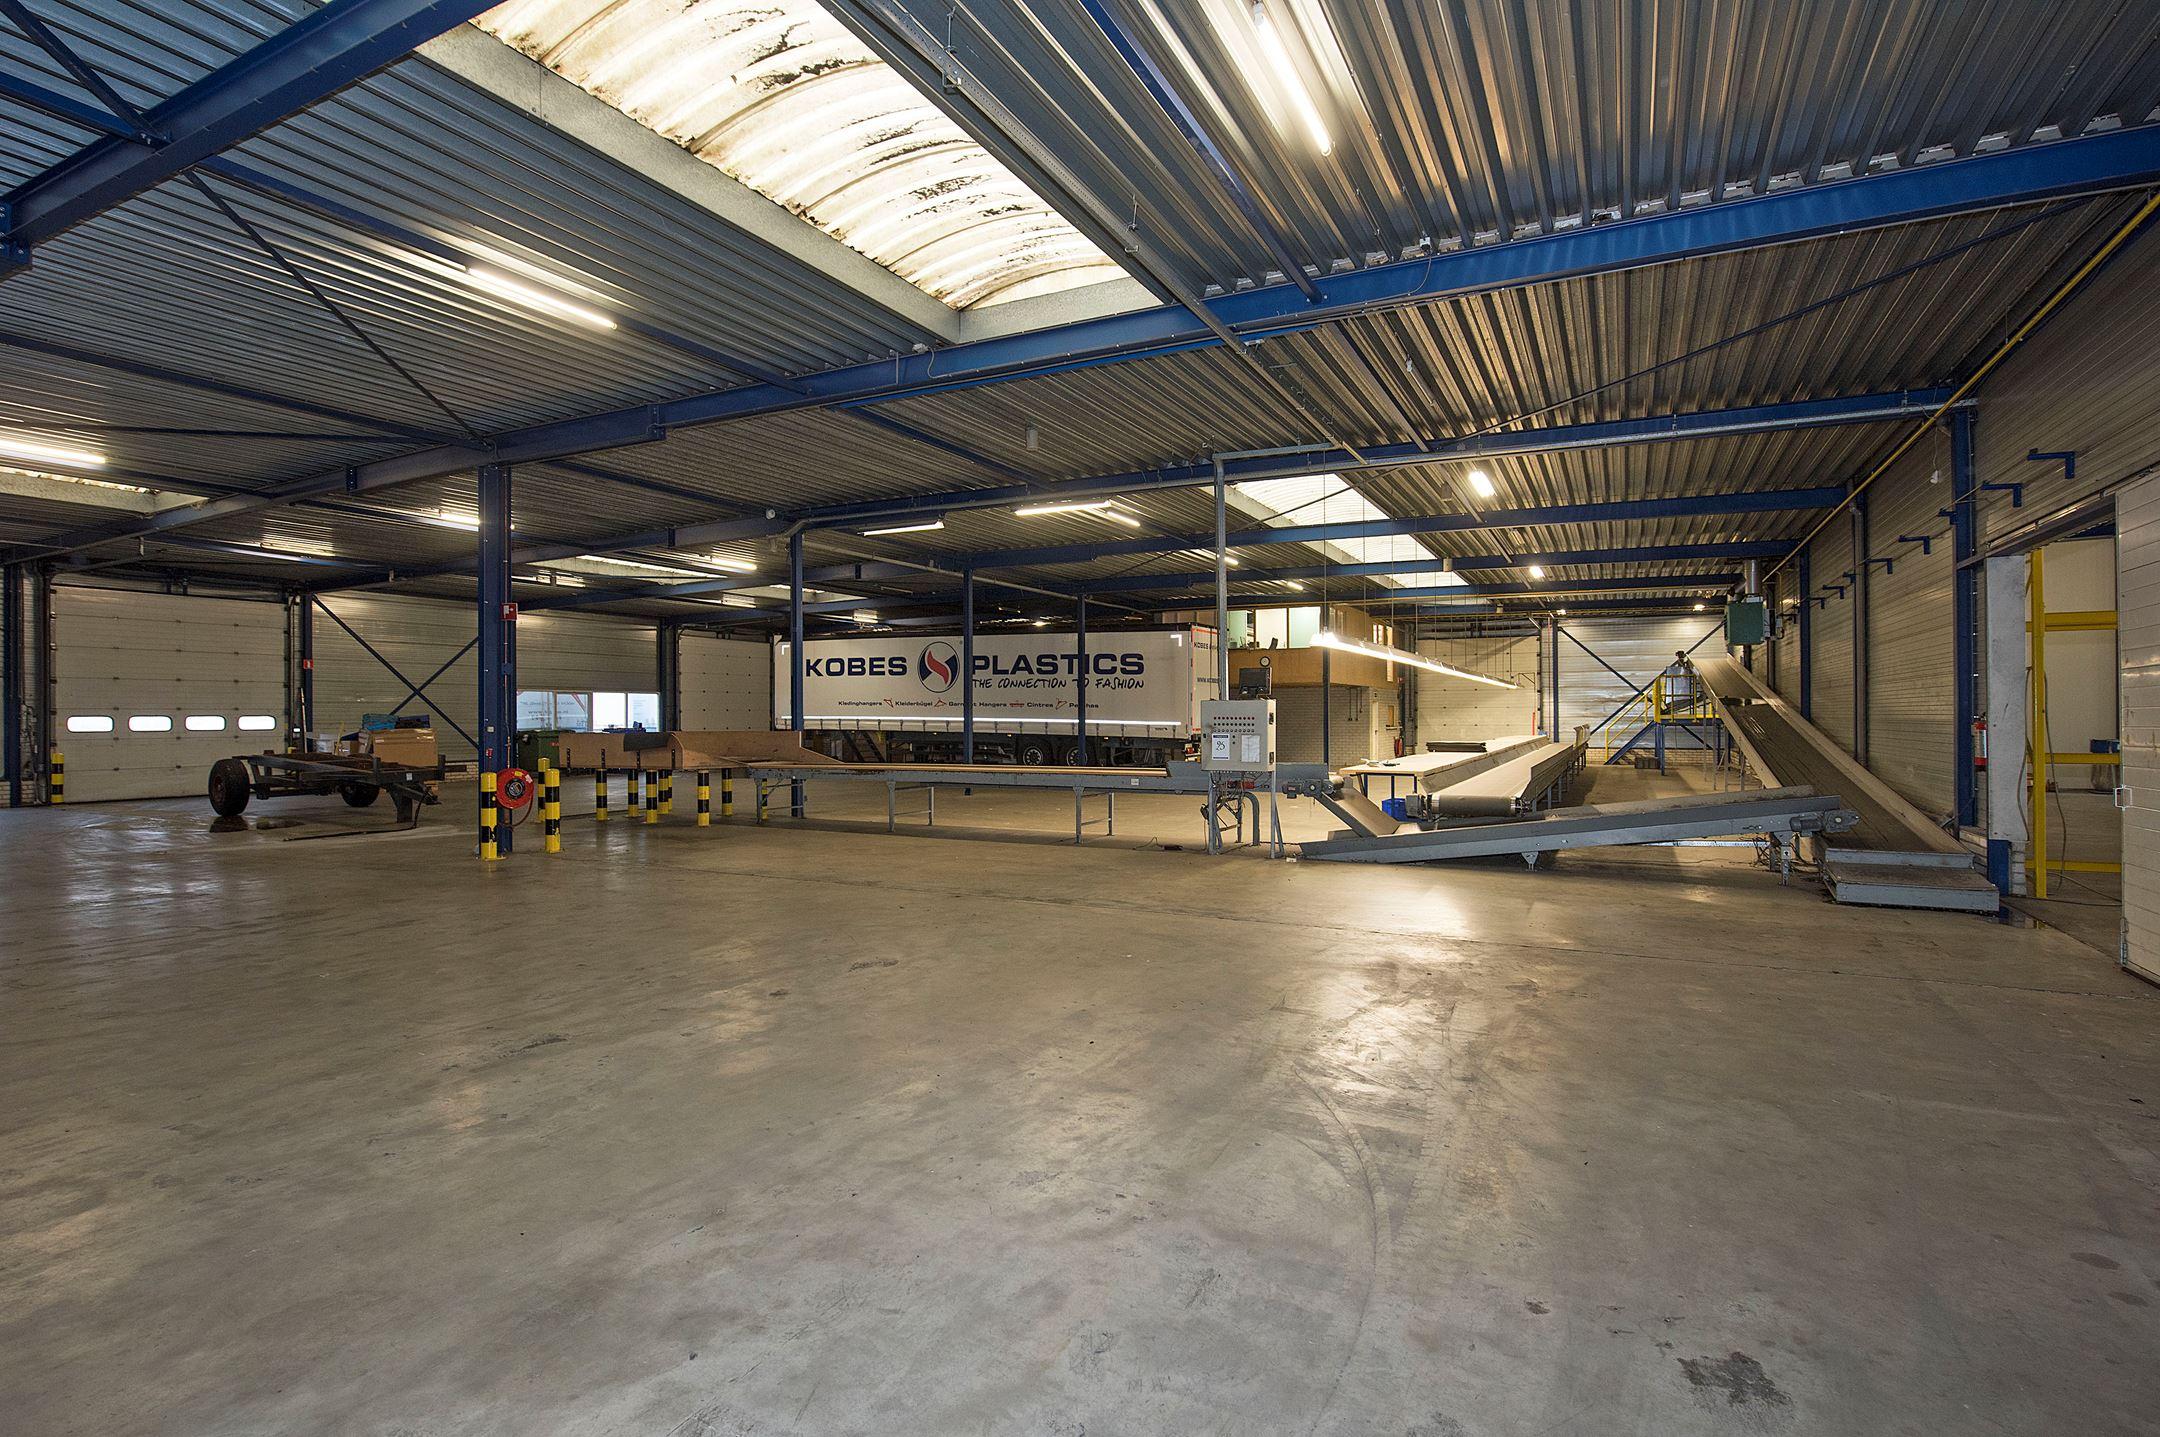 Almelo zoek verkocht bedrijvenpark twente 62 7602 kc for Funda woonboerderij twente